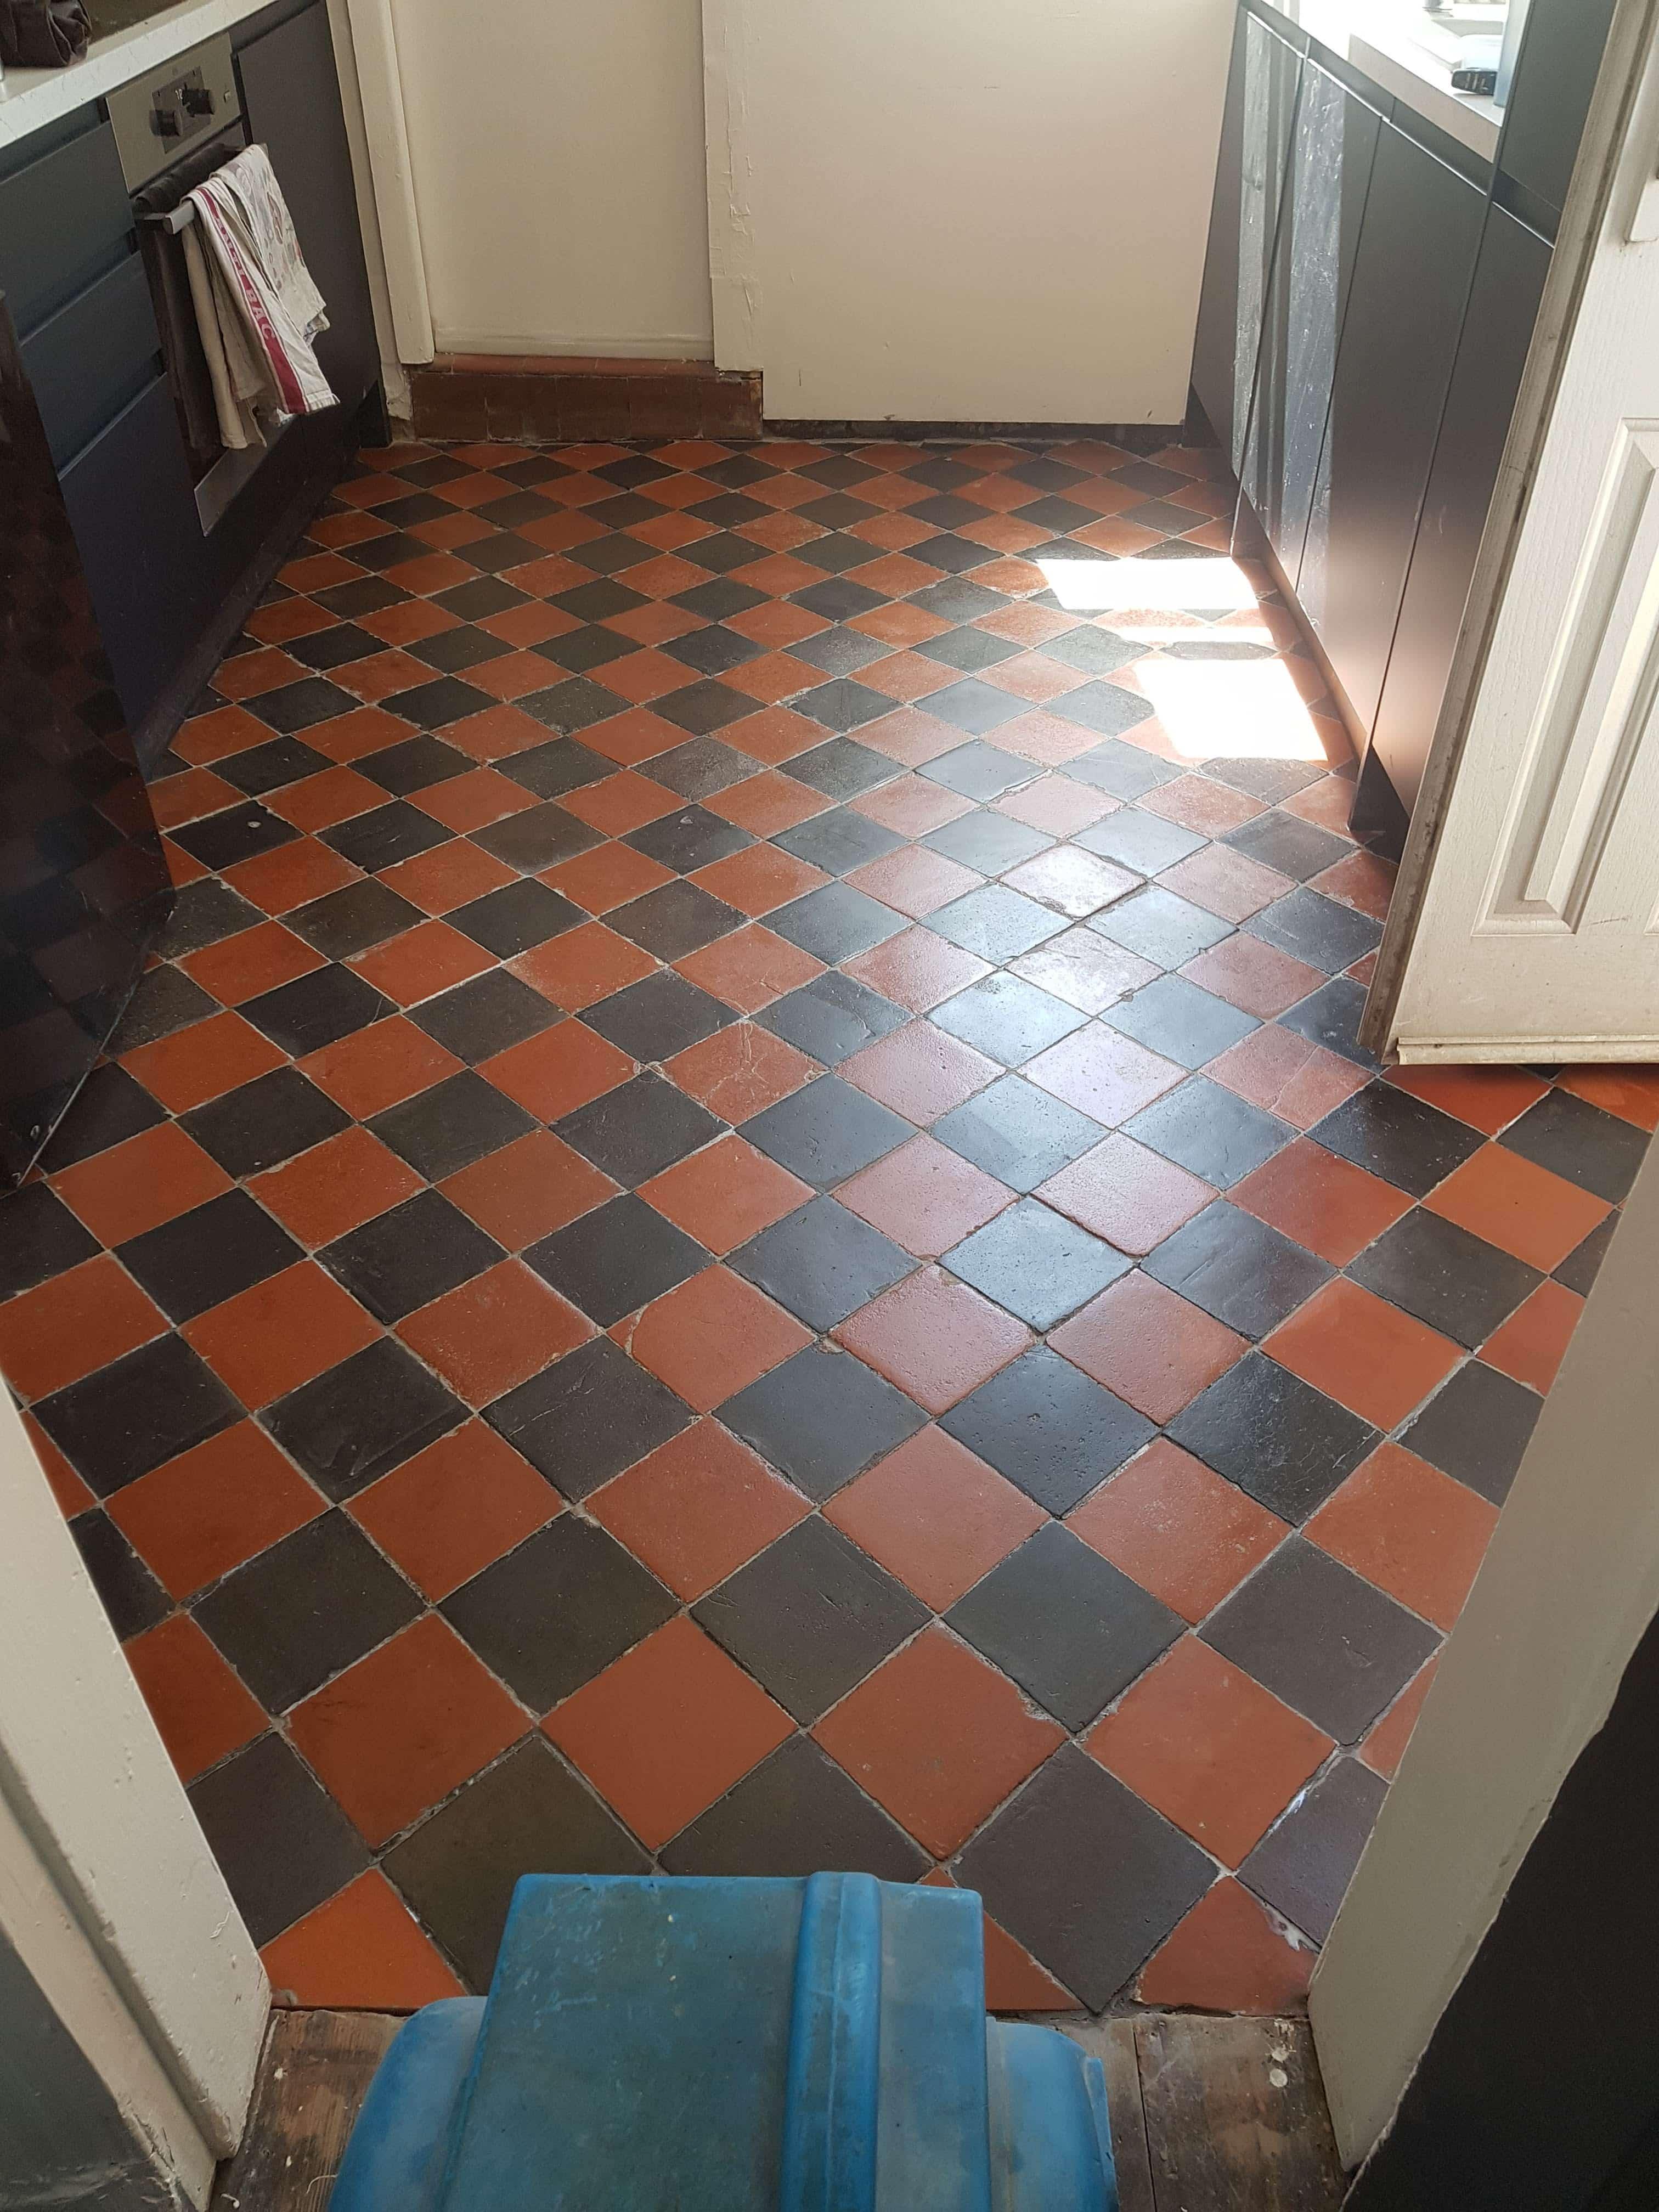 Wax Covered Quarry Tiled Floor After Renovation Caeathro Caernarfon